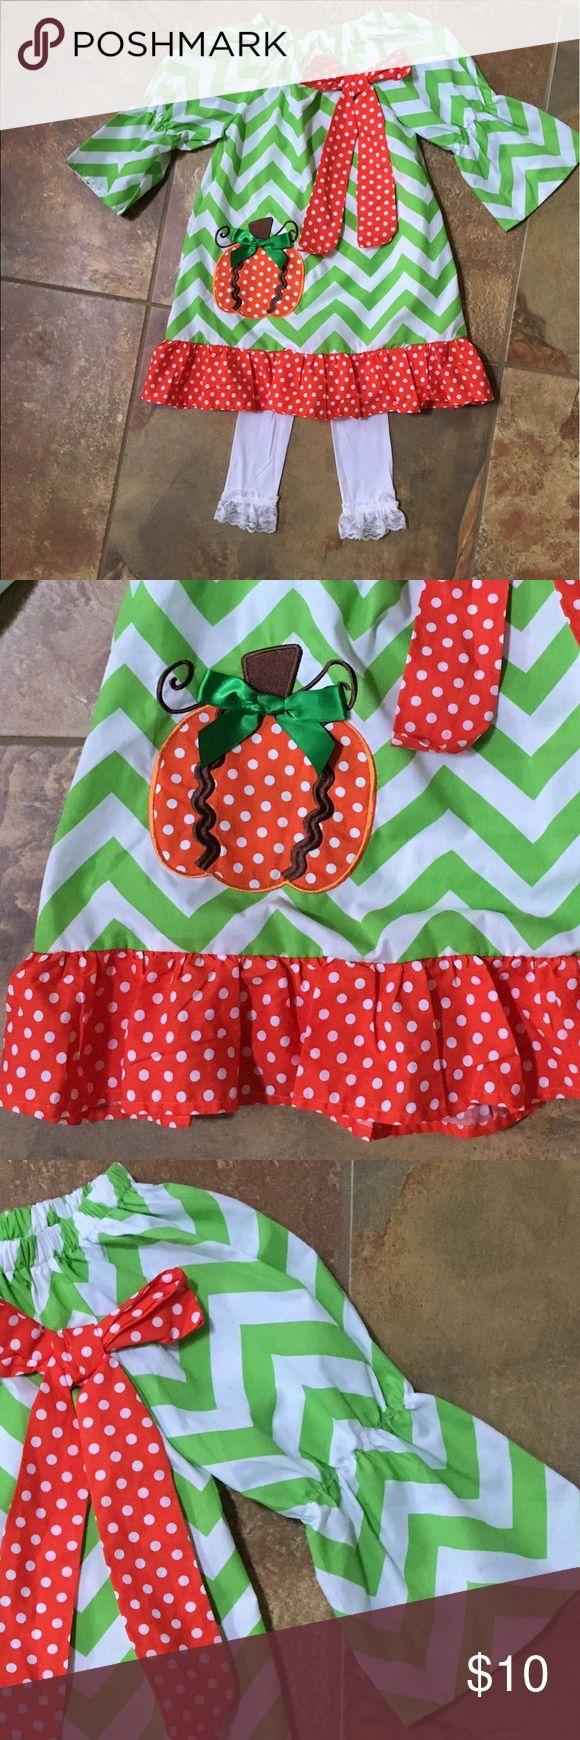 Precious chevron pumpkin dress NWOT Adorable little girl chevron pumpkin dress. Very cute paired with ruffle legged legging tights also in my closet. Xxxl size 8, XL size 6 Dresses Casual